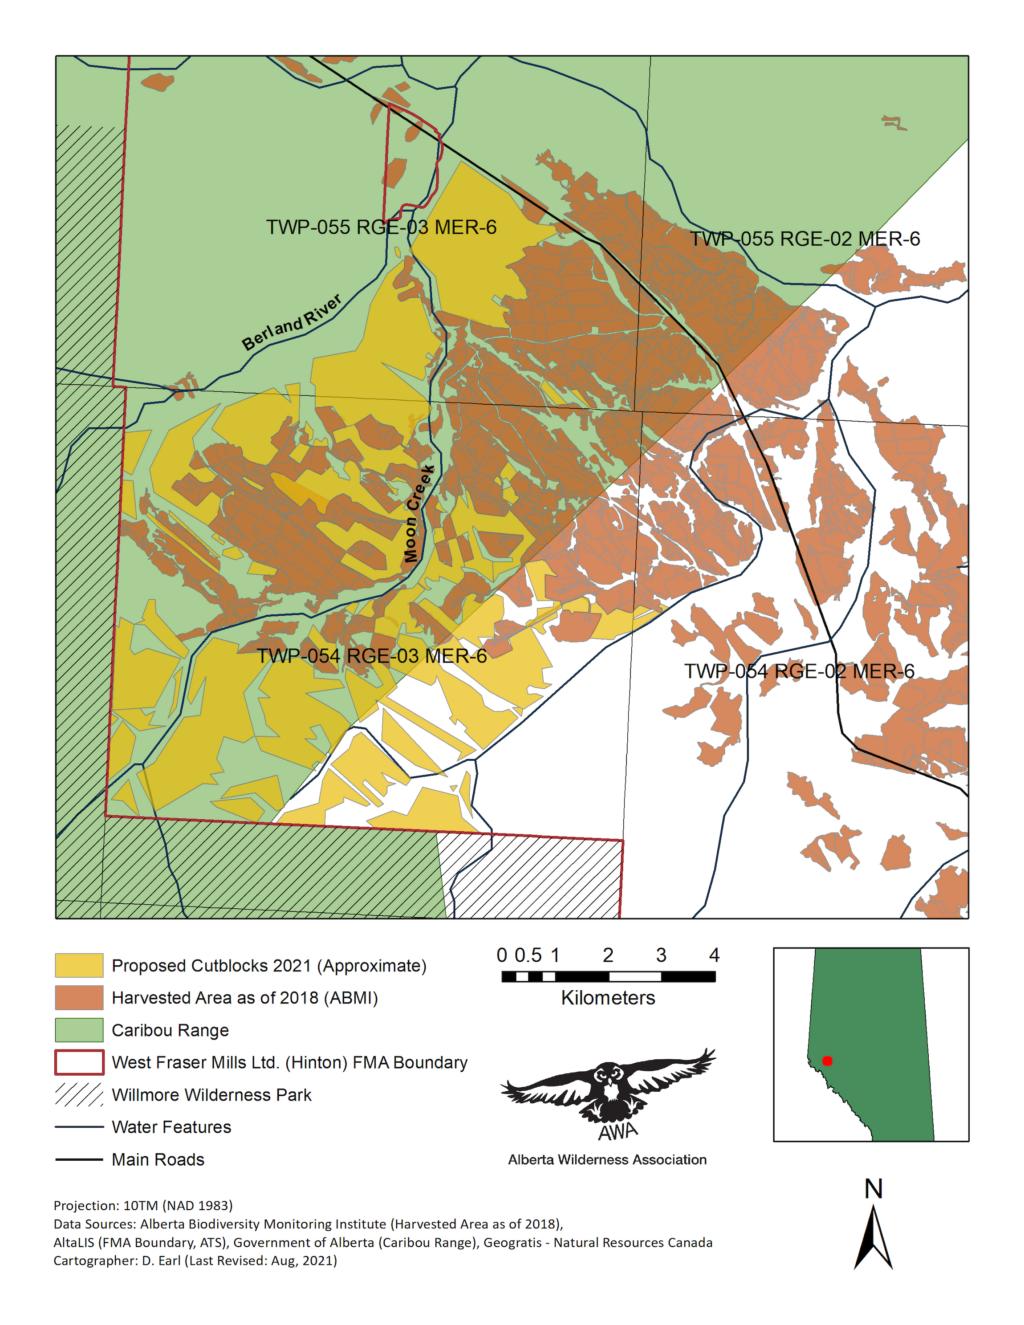 alberta wilderness association map of west fraser mills logging tenure and caribou habitat